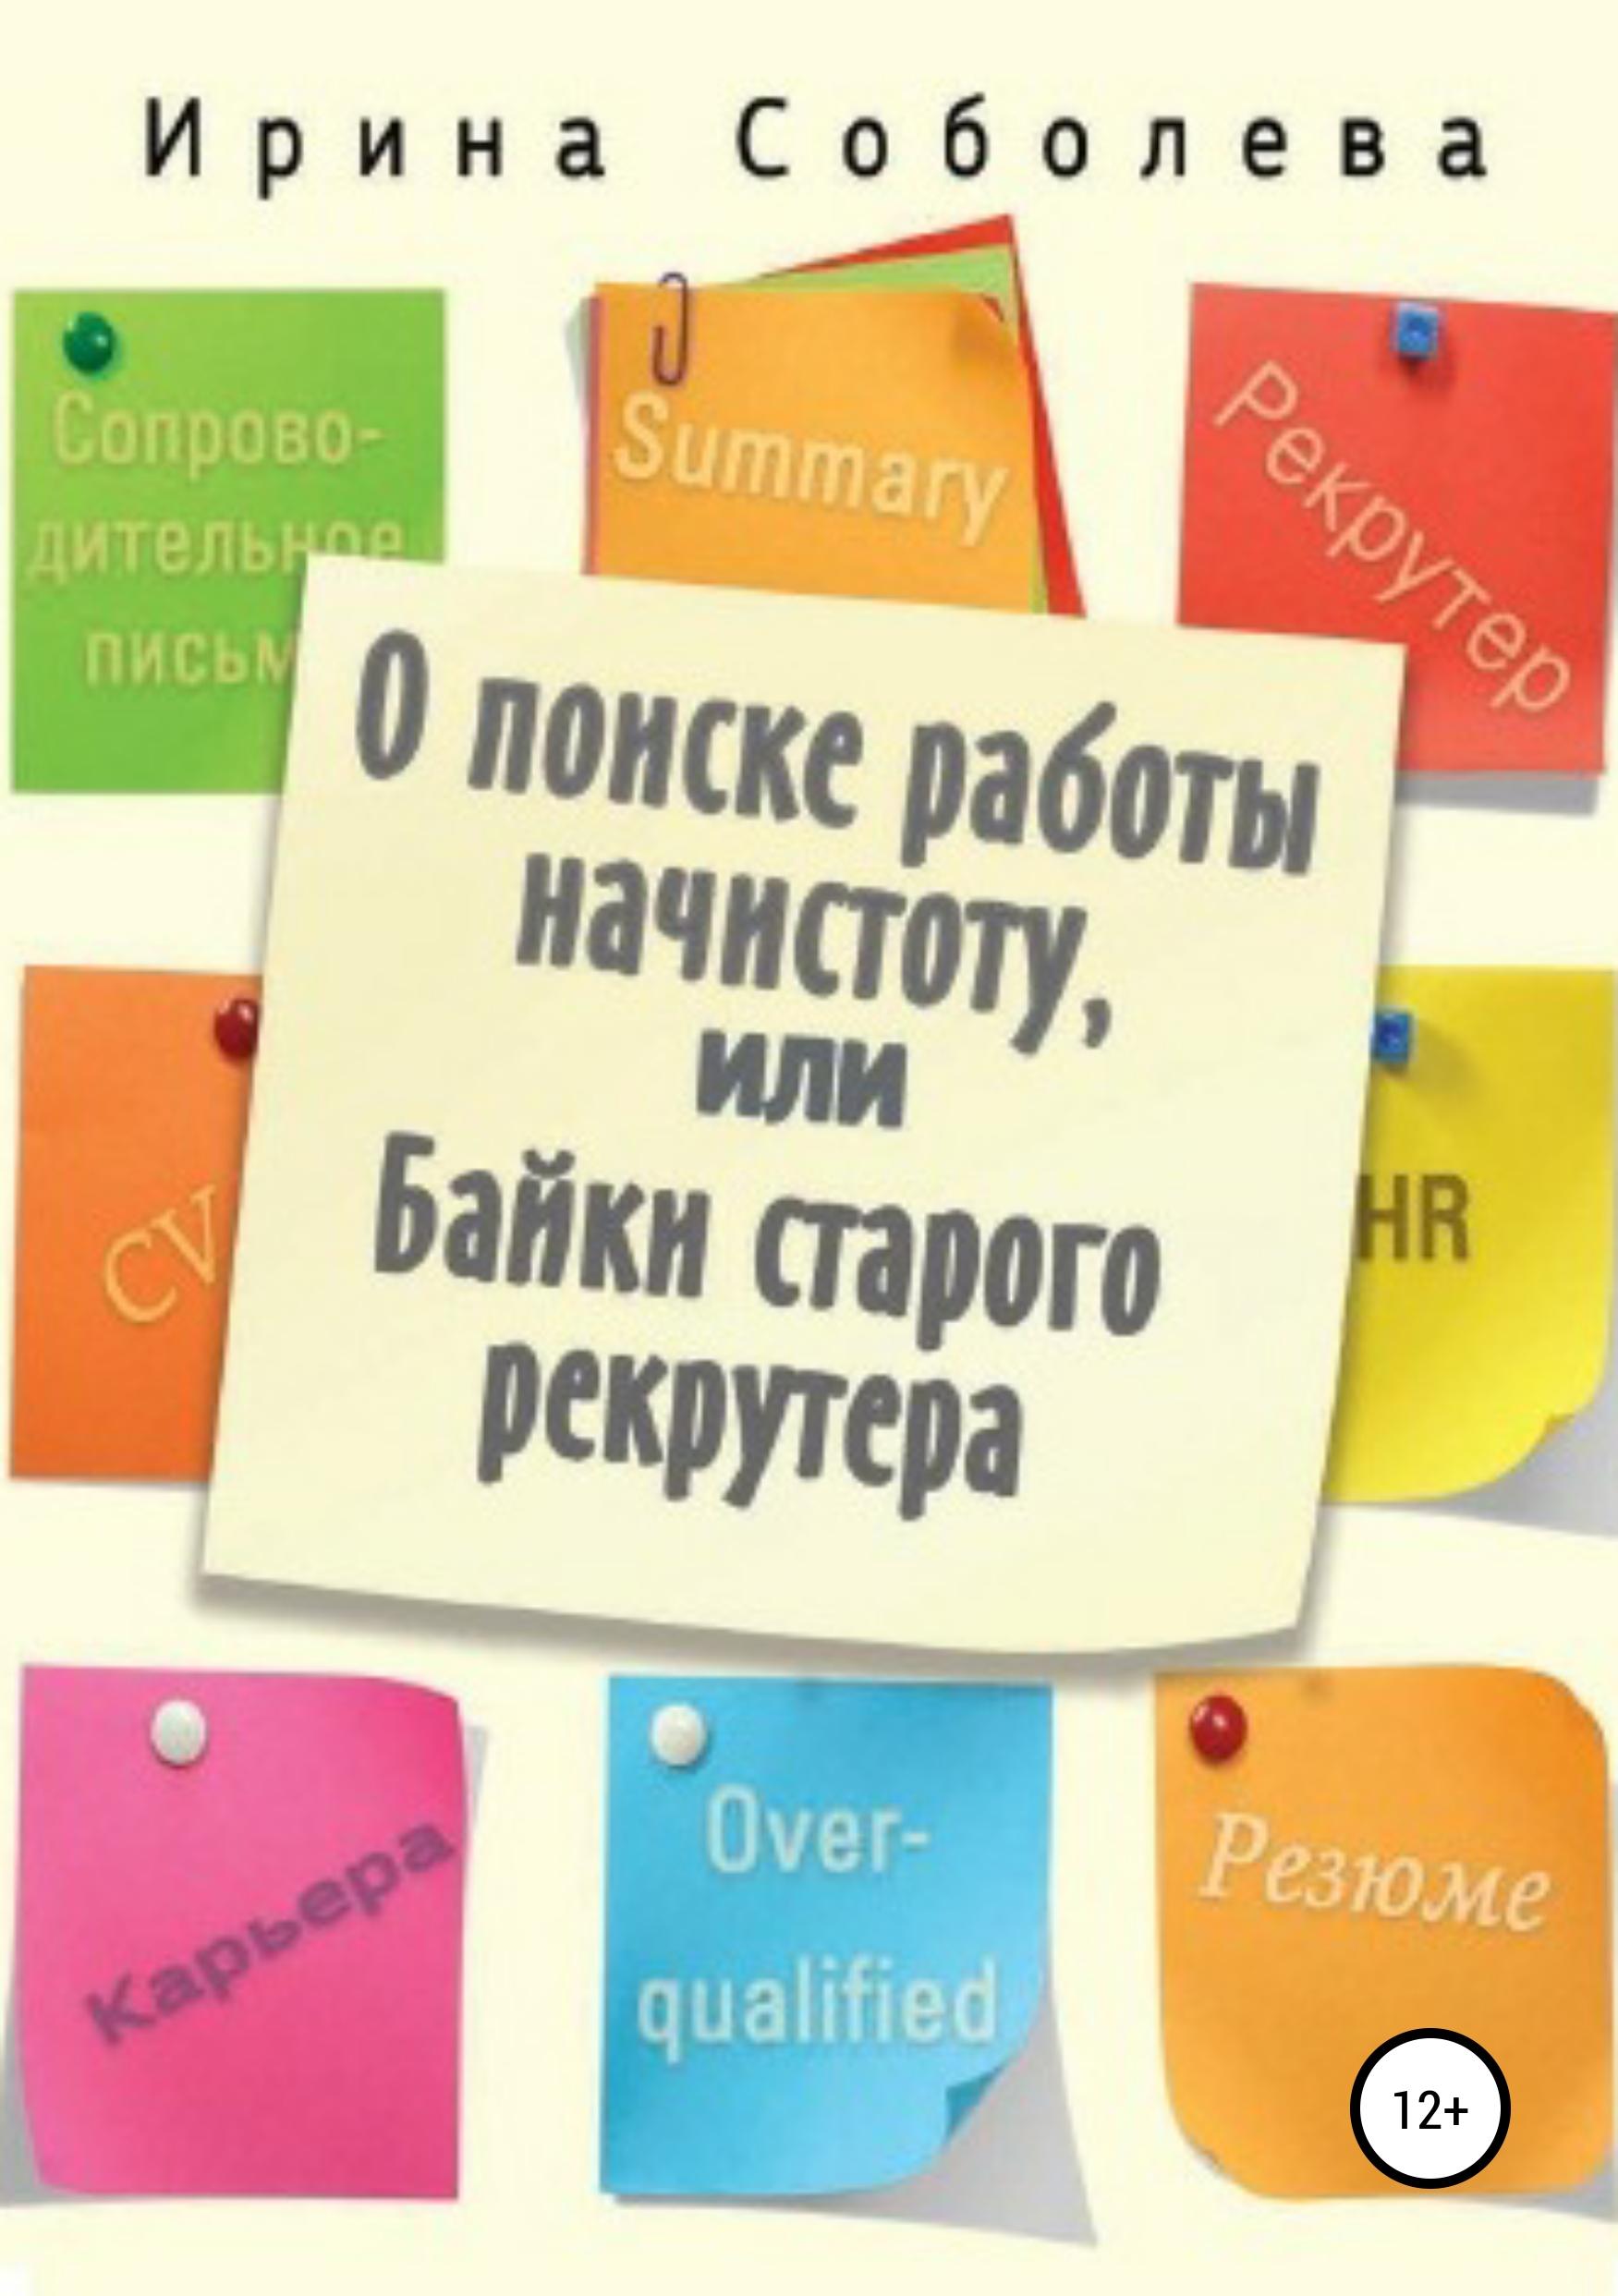 Обложка книги. Автор - Ирина Соболева